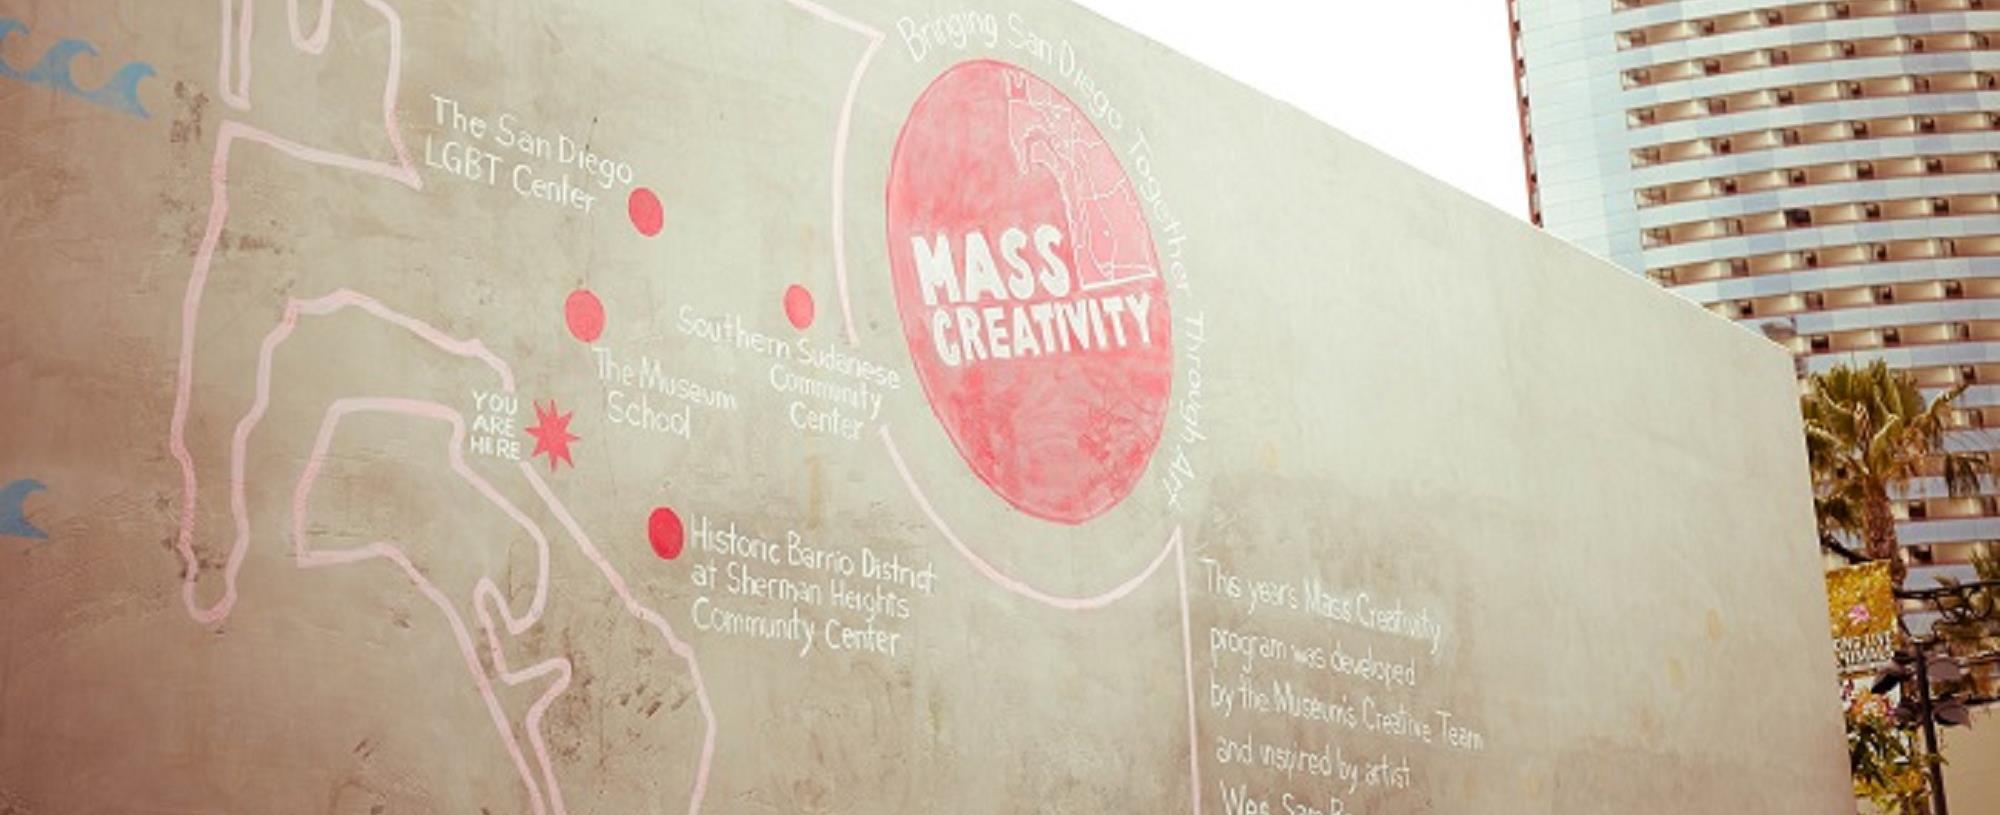 Mass Creativity